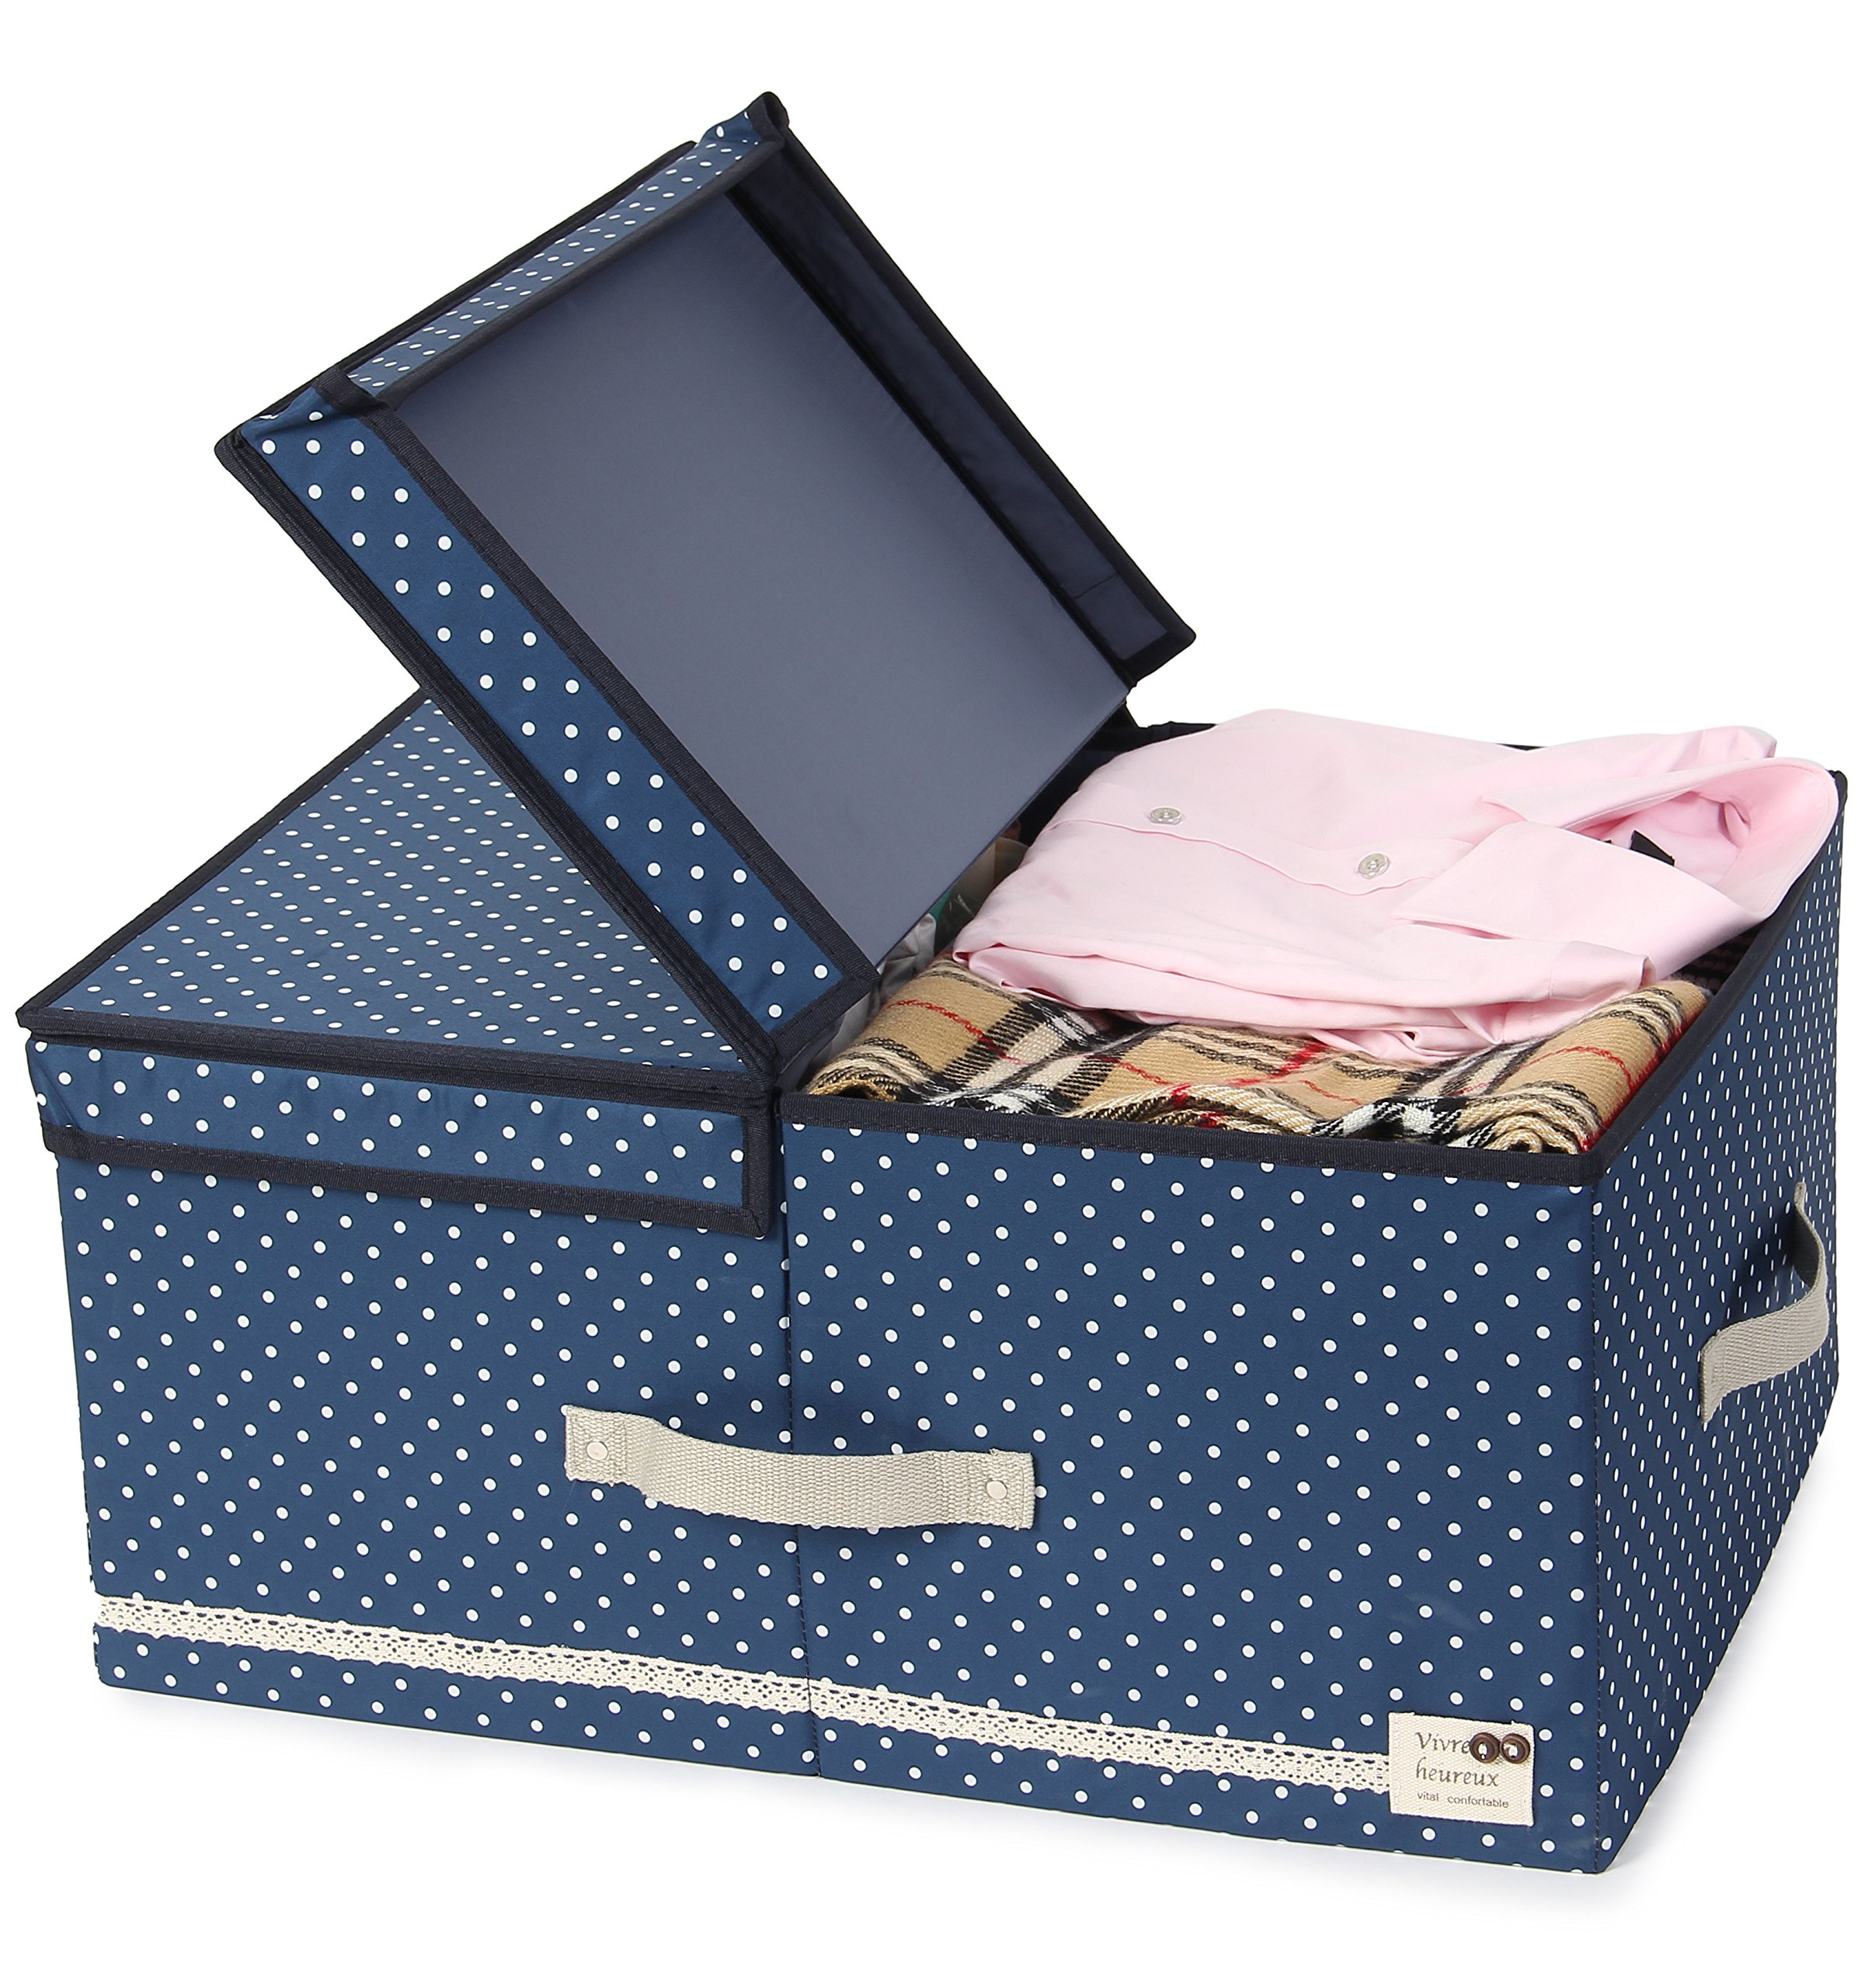 JJ POWER Collapsible Clothes Storage Box, Under Bed Organizer Drawer (Navy Dot)